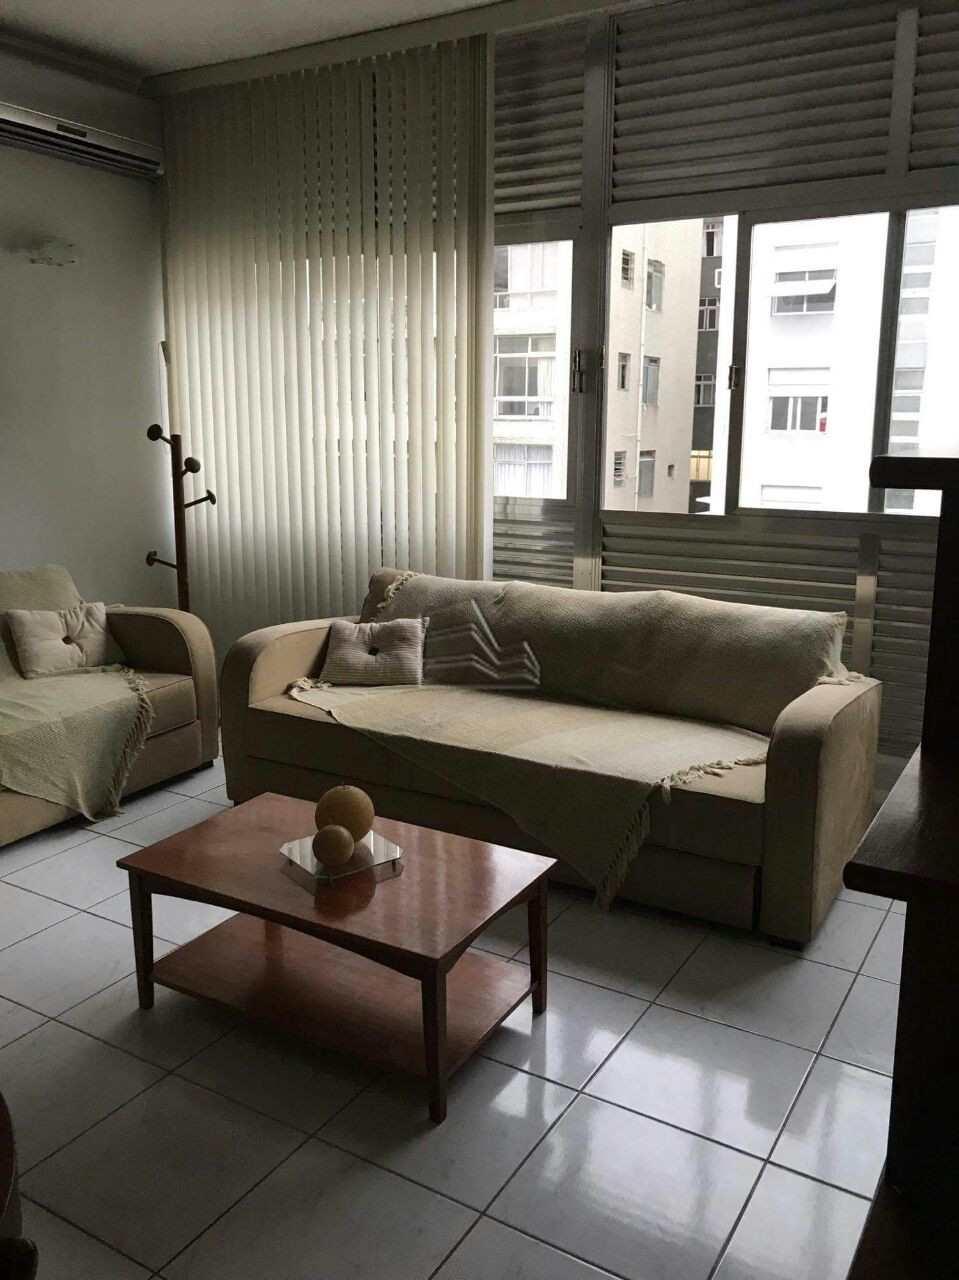 sala living aluguel boqueirao (6)